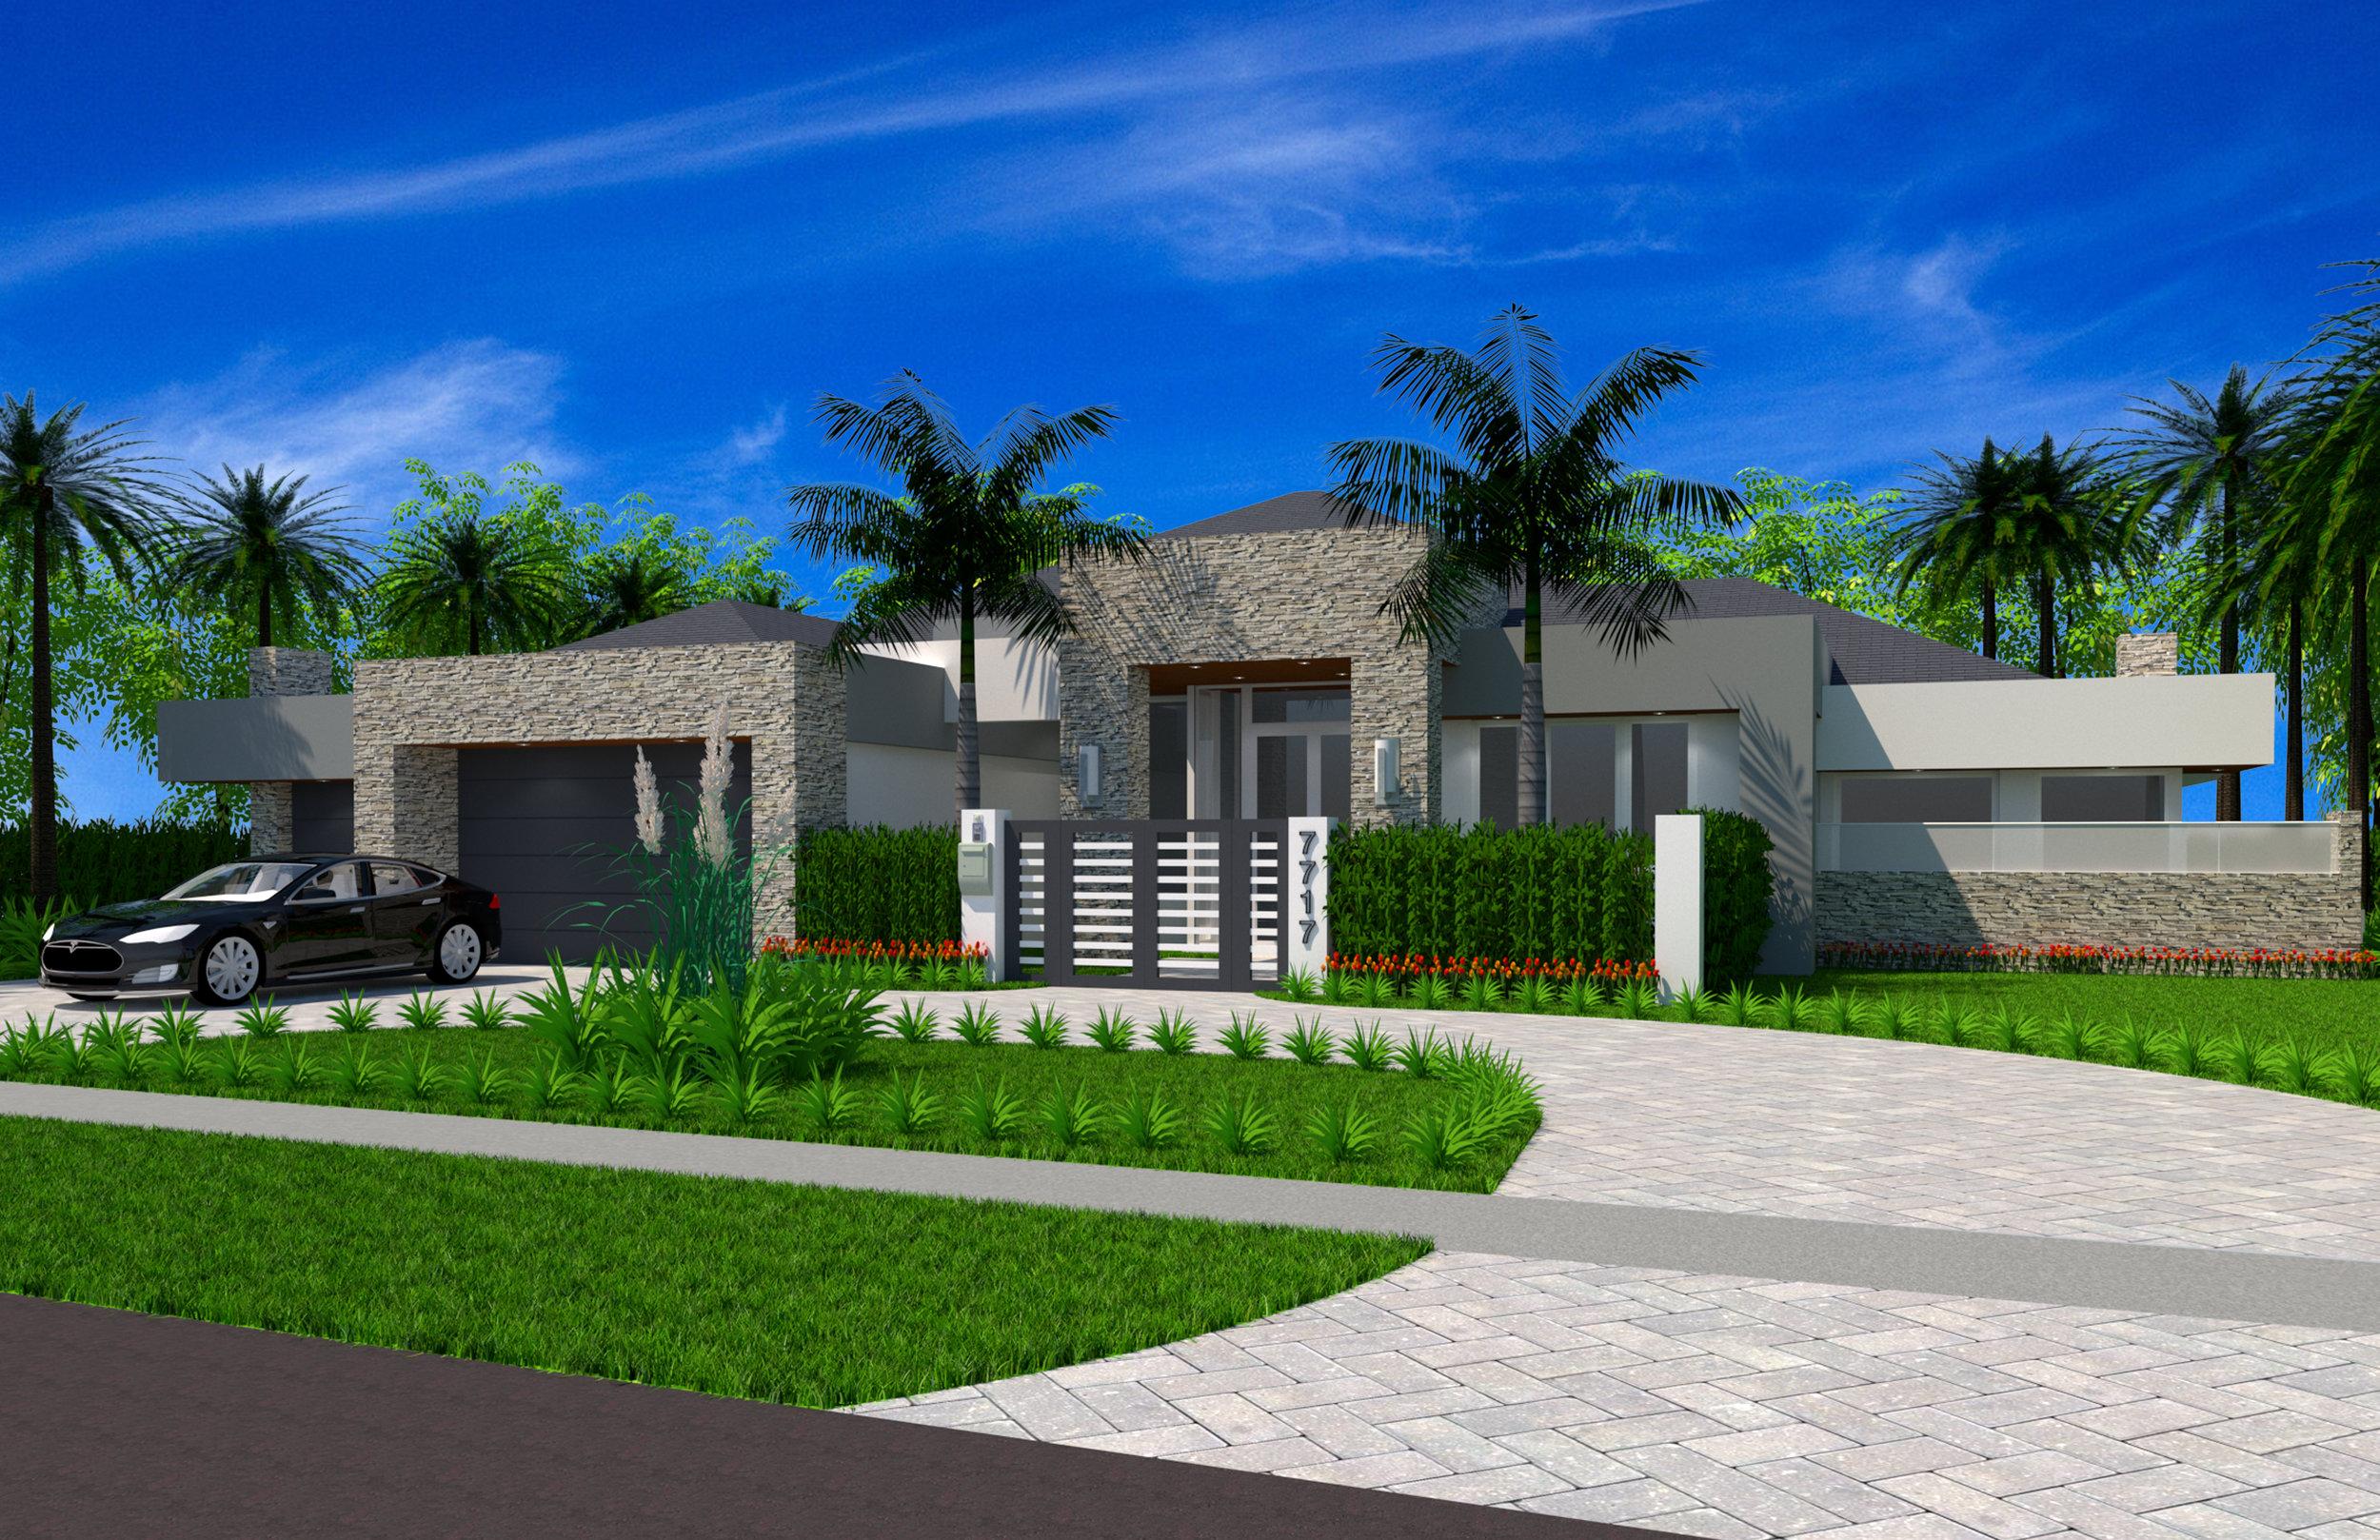 new-modern-home-florida-architecture-render